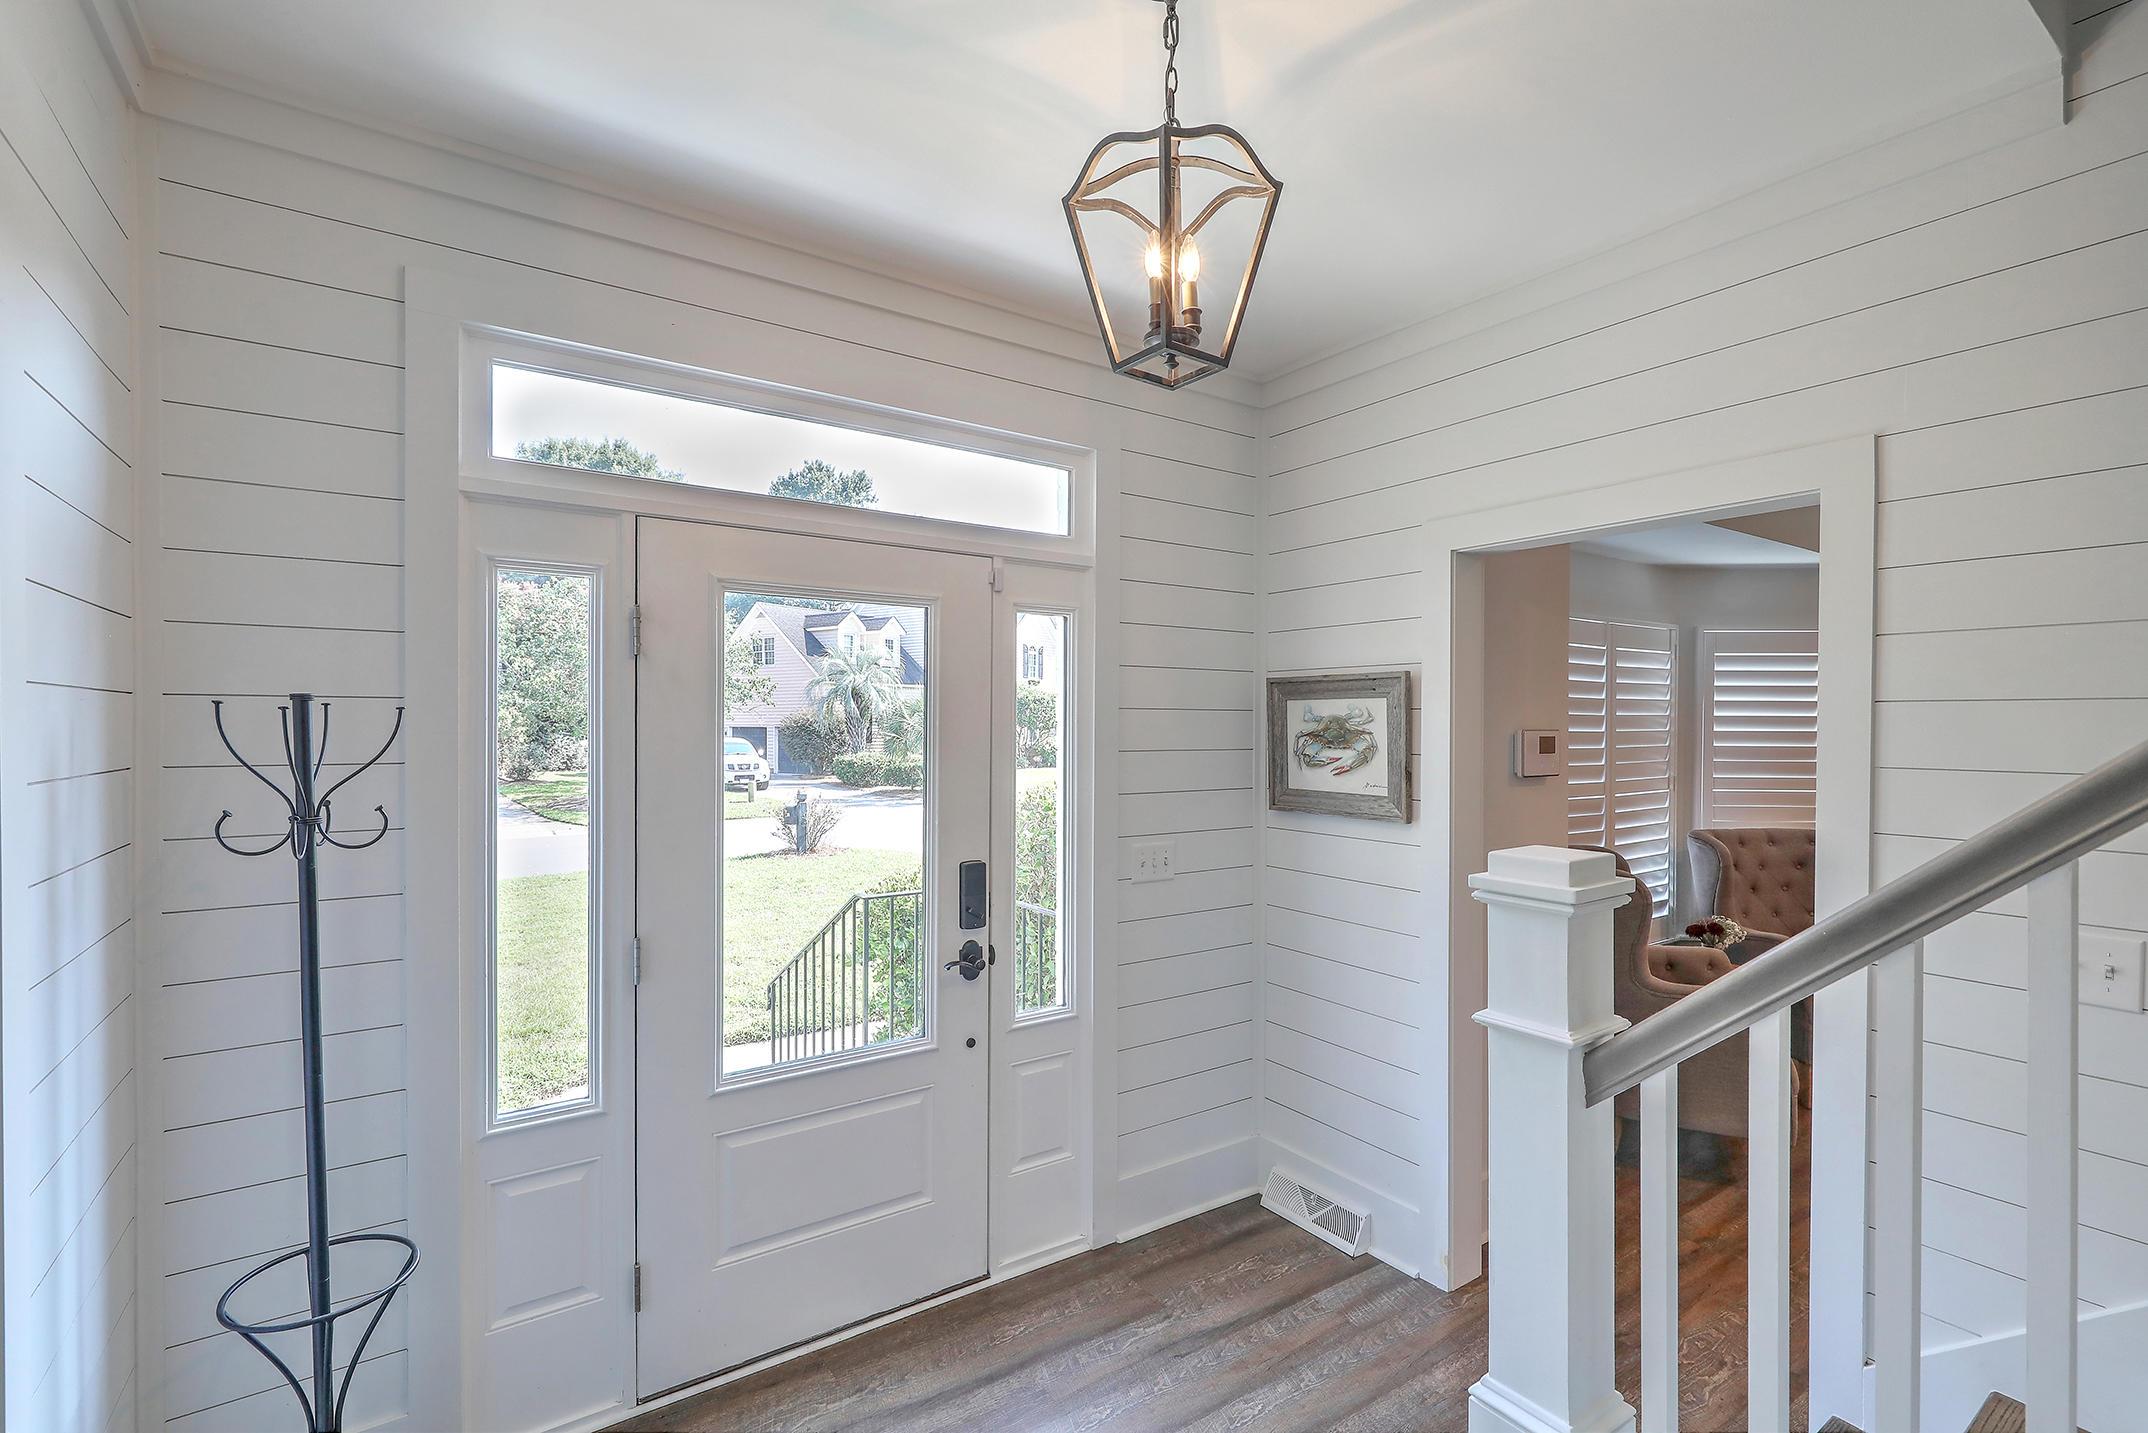 Hobcaw Creek Plantation Homes For Sale - 619 Palisades, Mount Pleasant, SC - 24